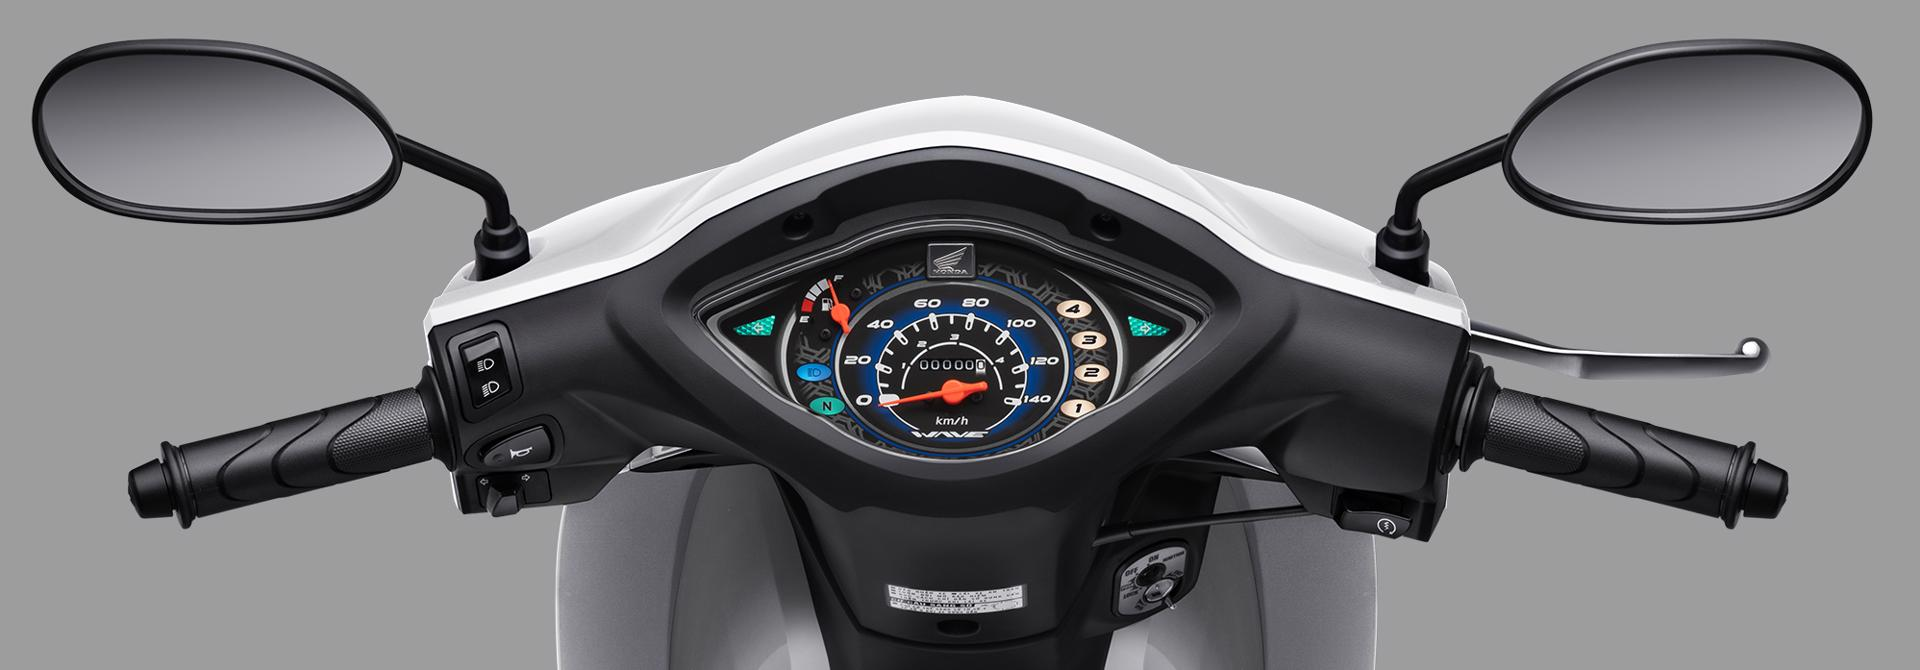 Wave Alpha 110cc mới ra mắt, giá 17.790.000 đồng